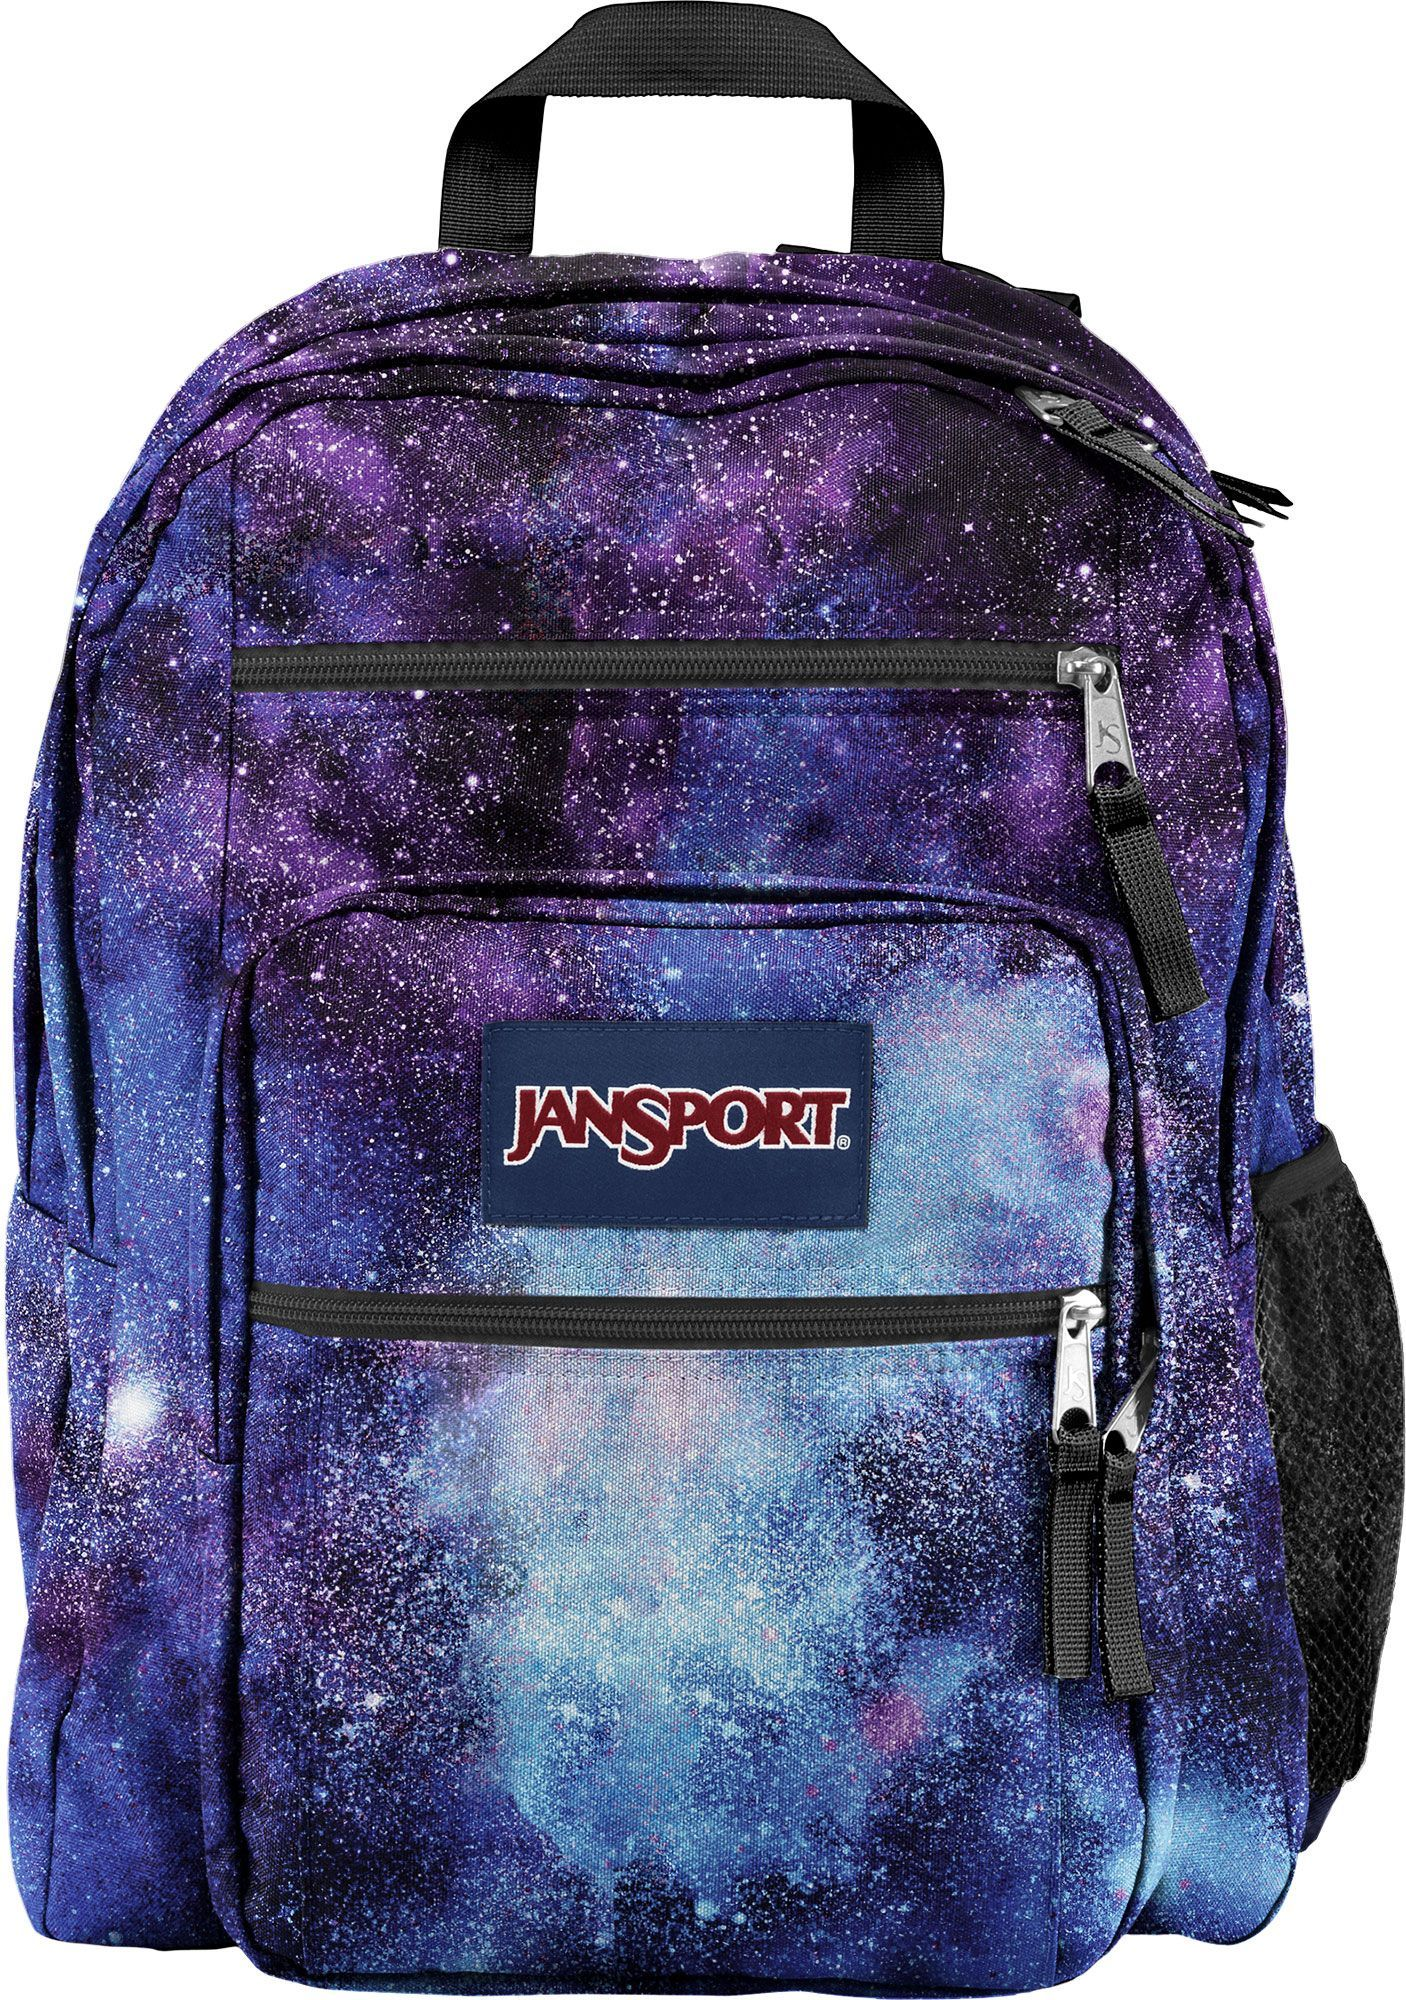 2fd3ad334 JanSport Big Student Backpack, Black in 2019 | Products | Backpacks ...